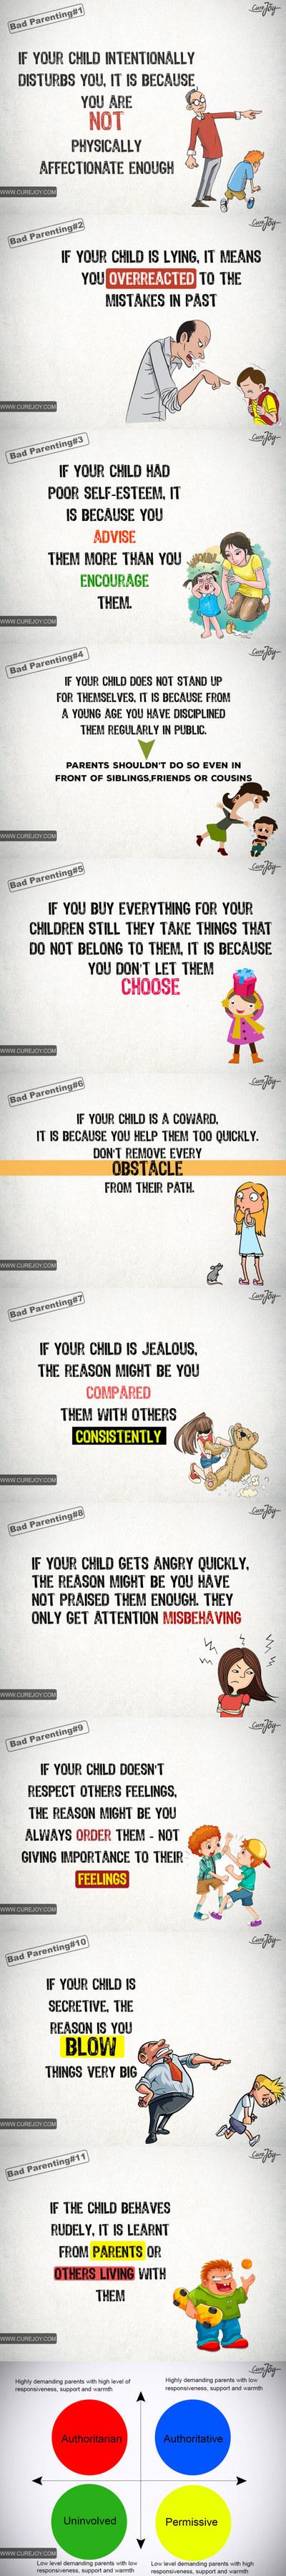 parenting infographic.jpeg